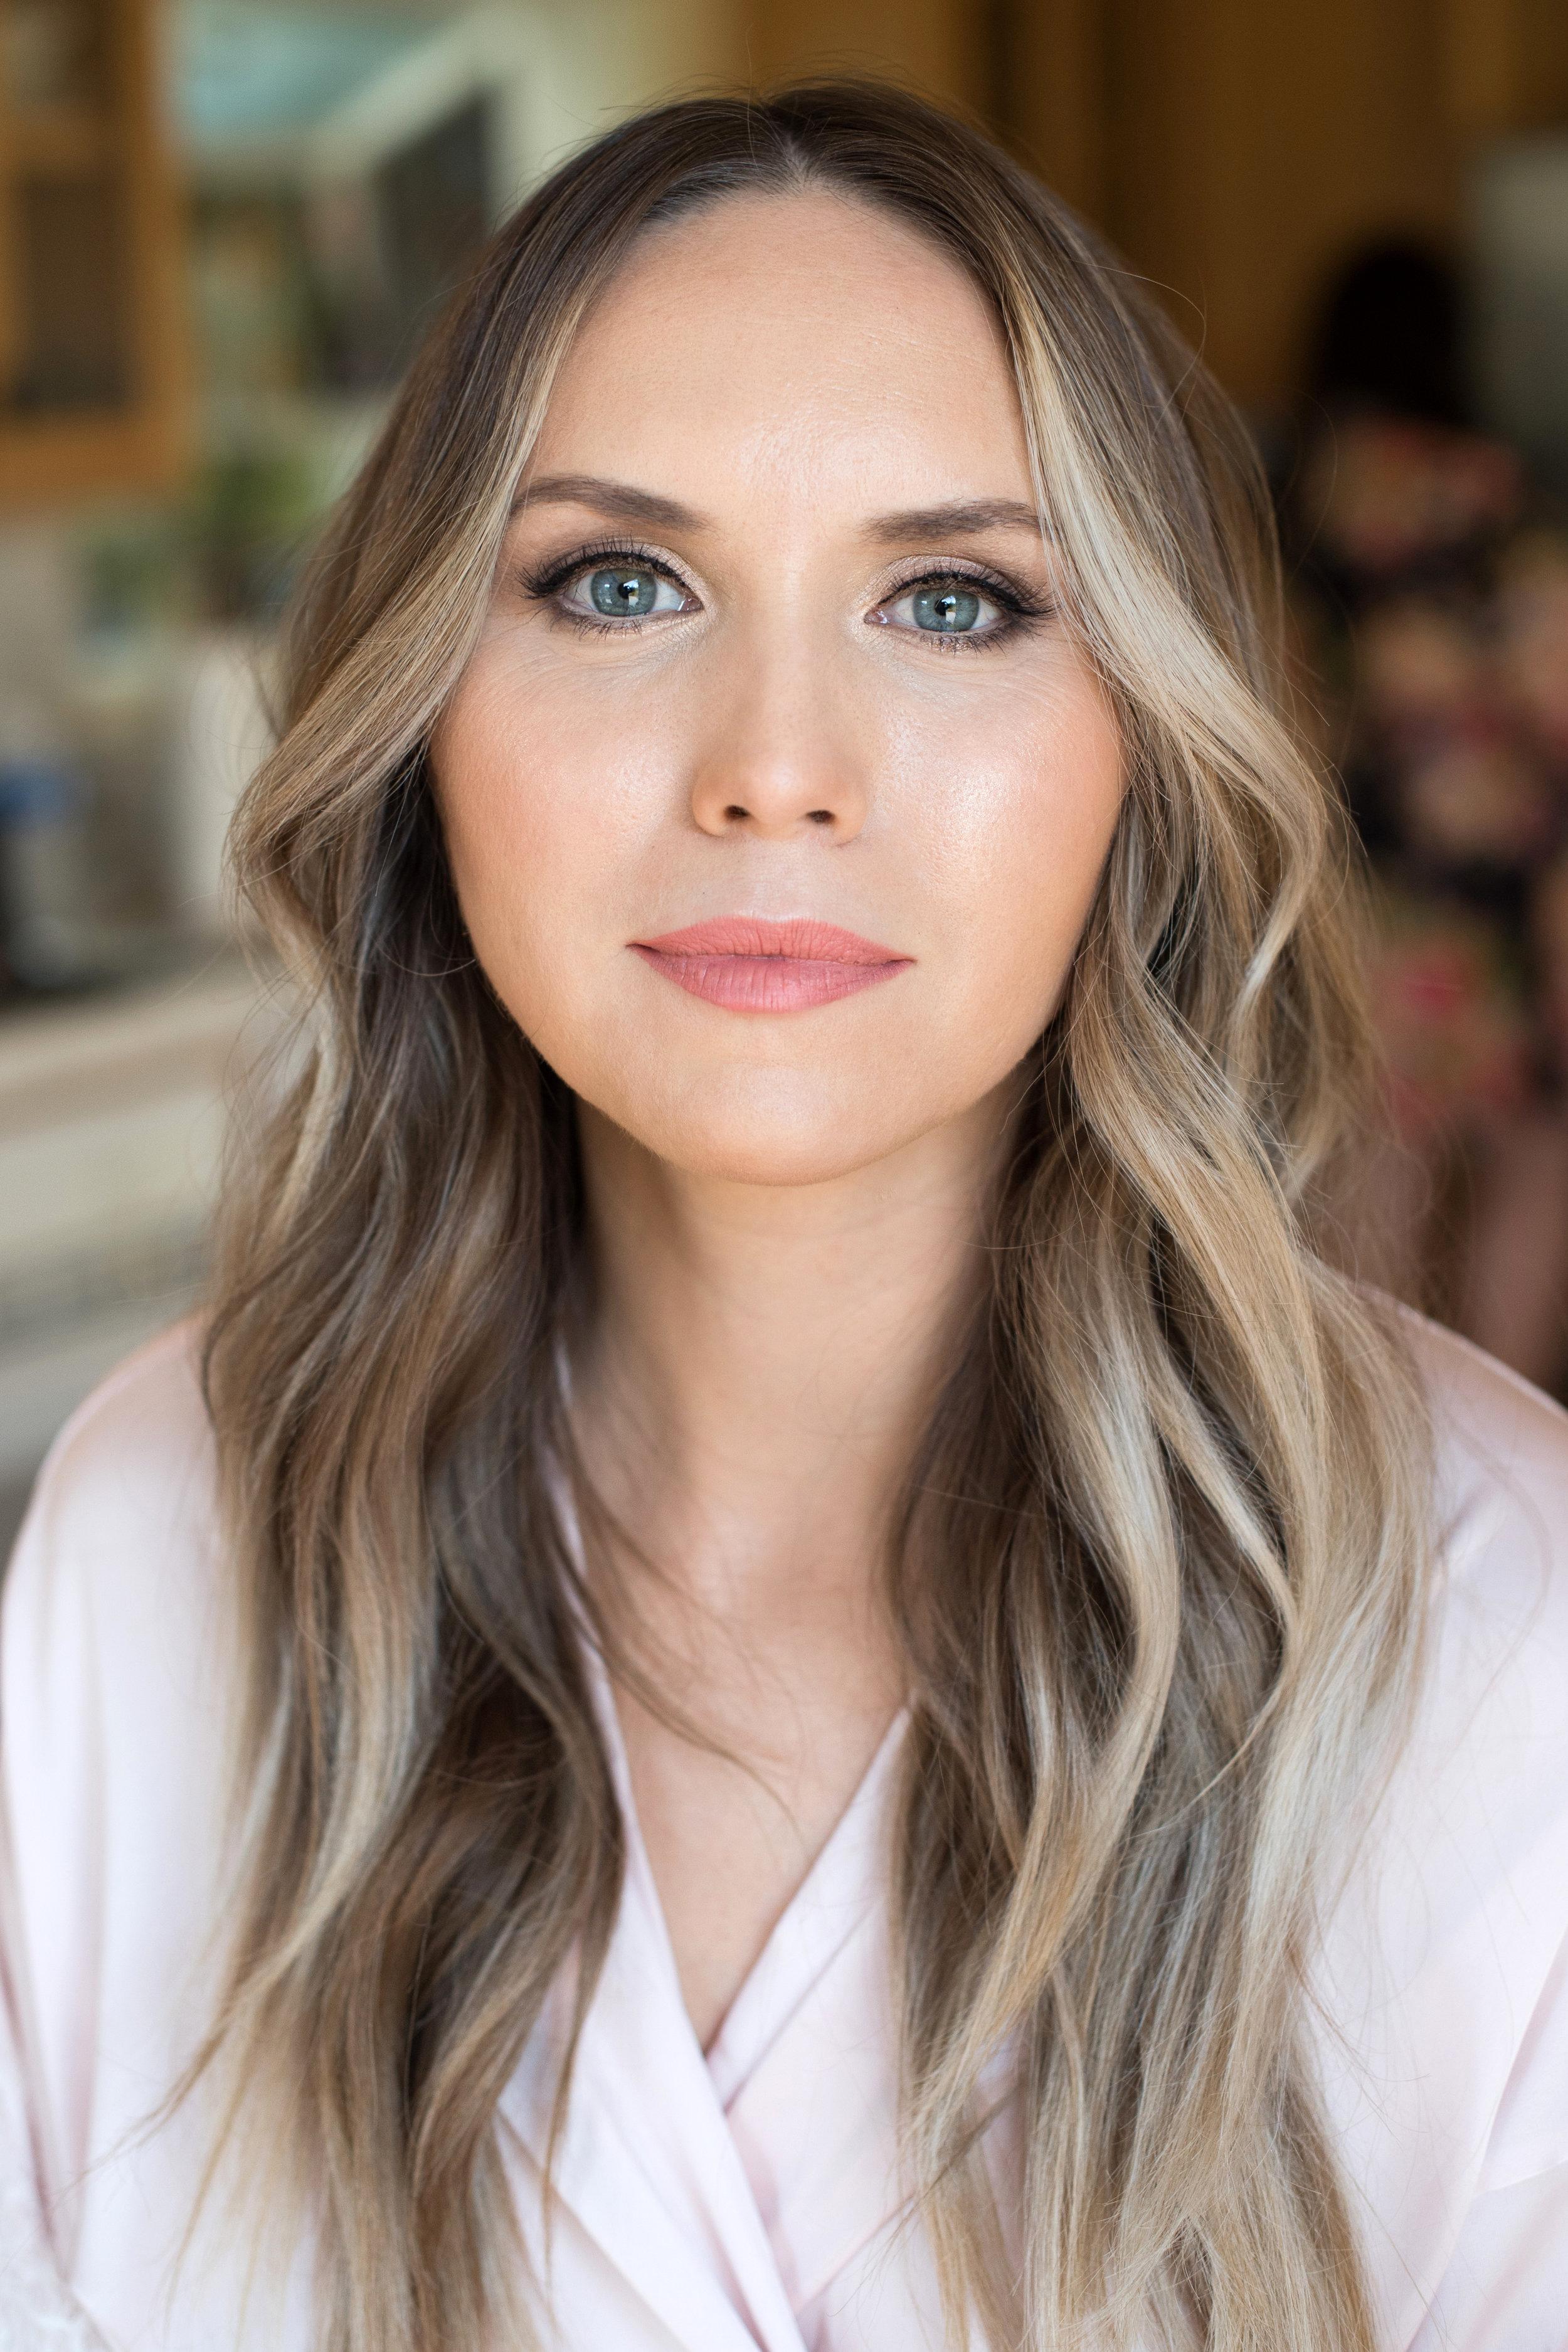 Bridal natural glowing makeup blue eyes and hair long wavy by Beauty Affair_5.jpg